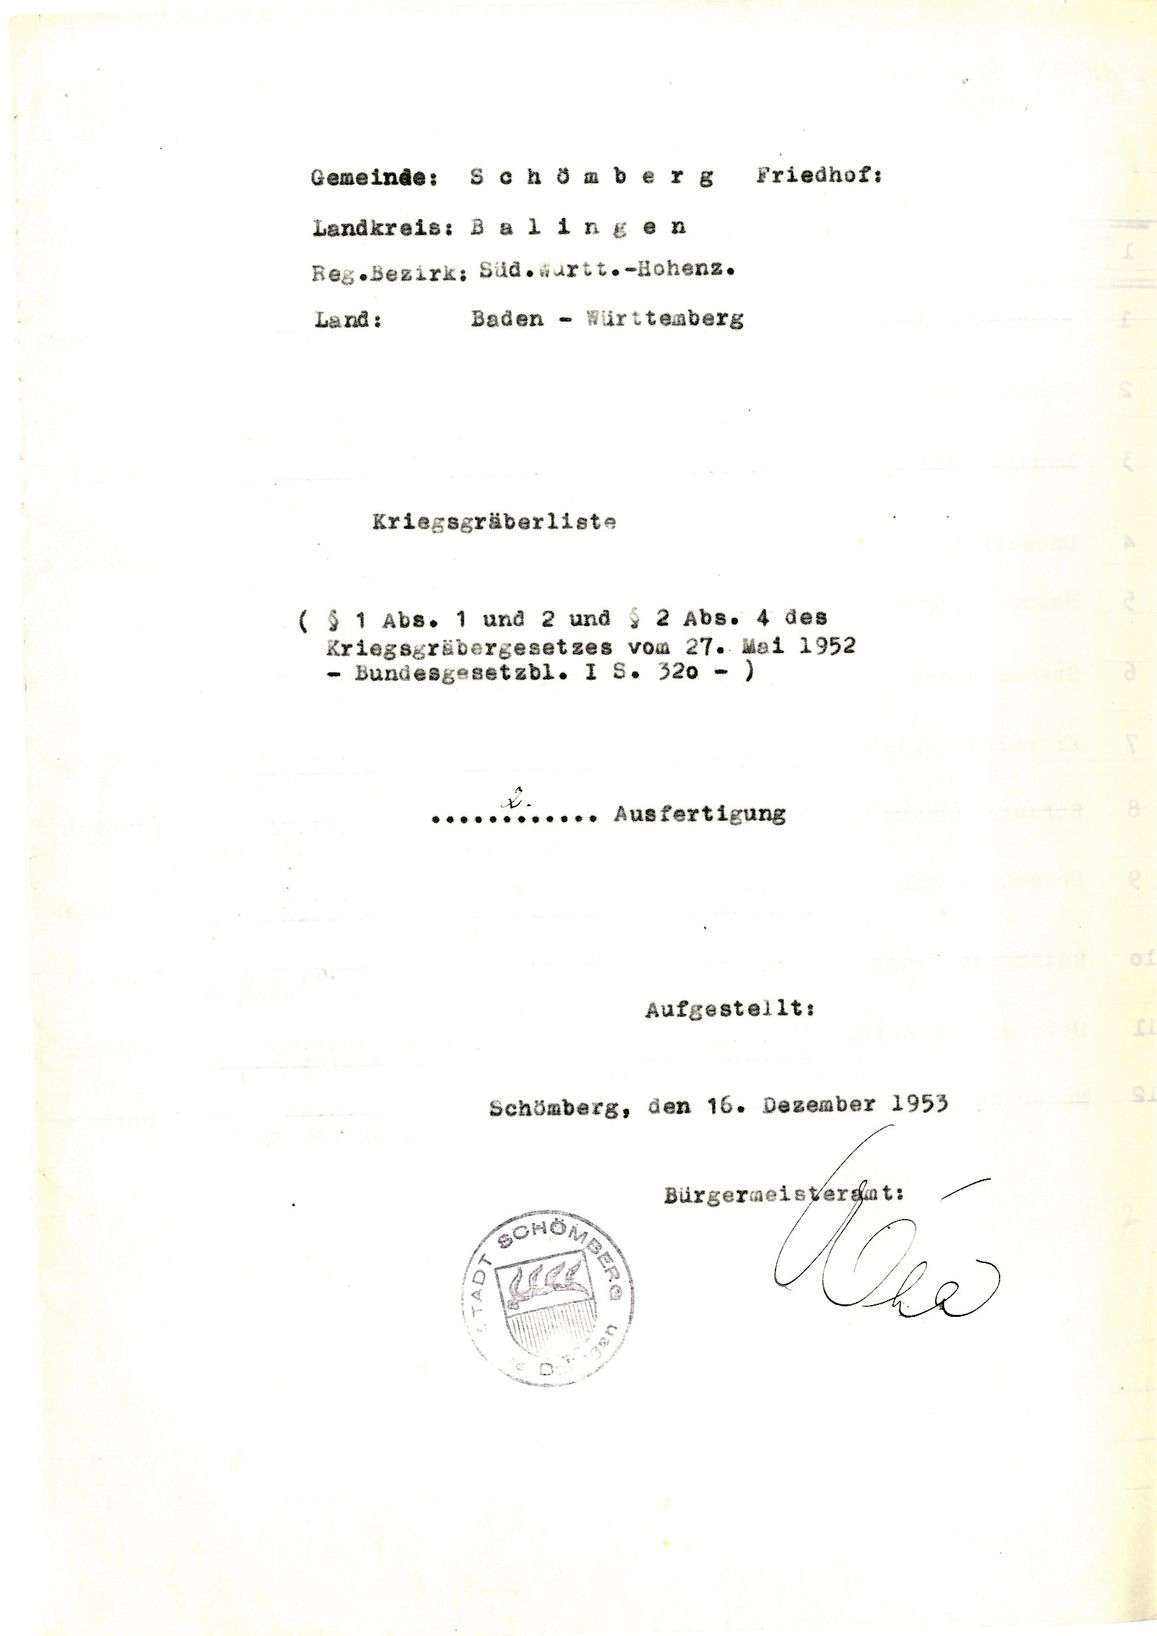 Schömberg, Bild 3